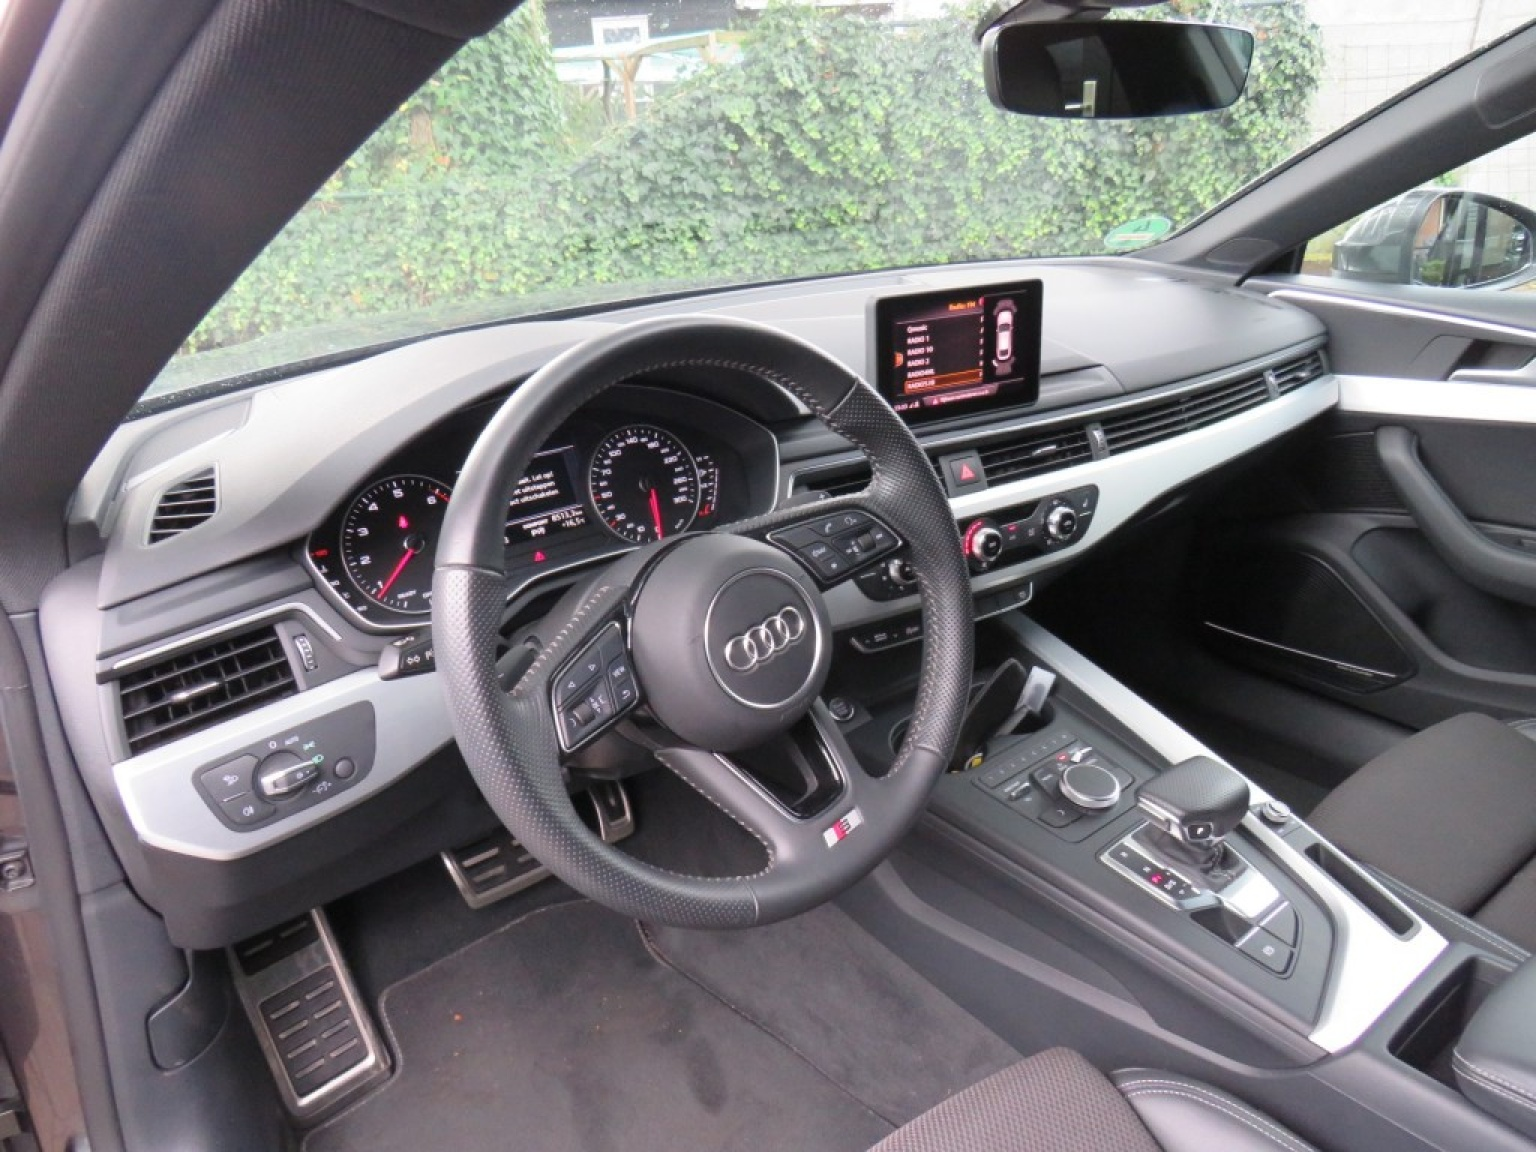 Audi-A5-12